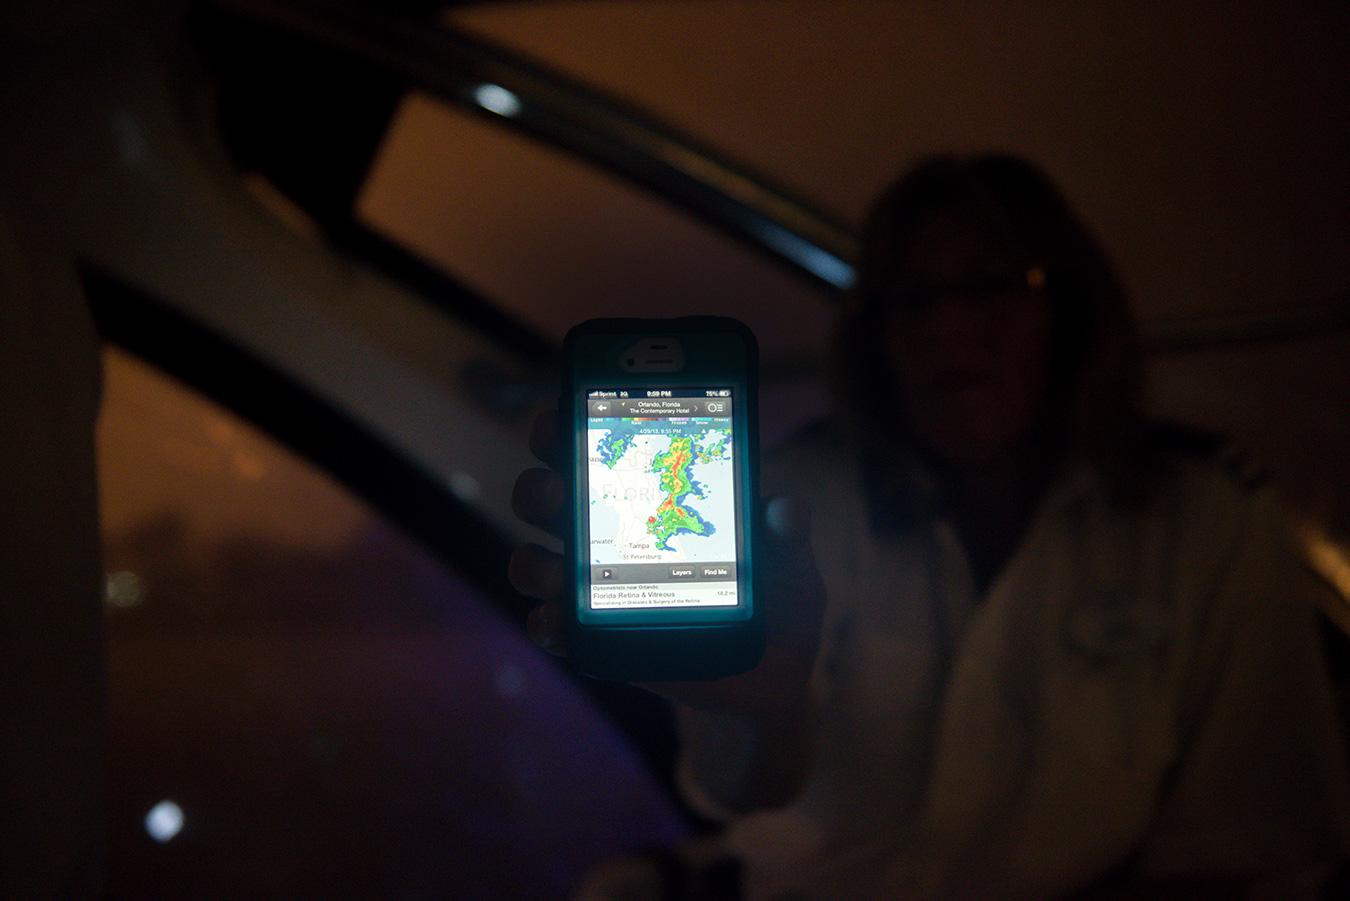 Kris showing me the live radar